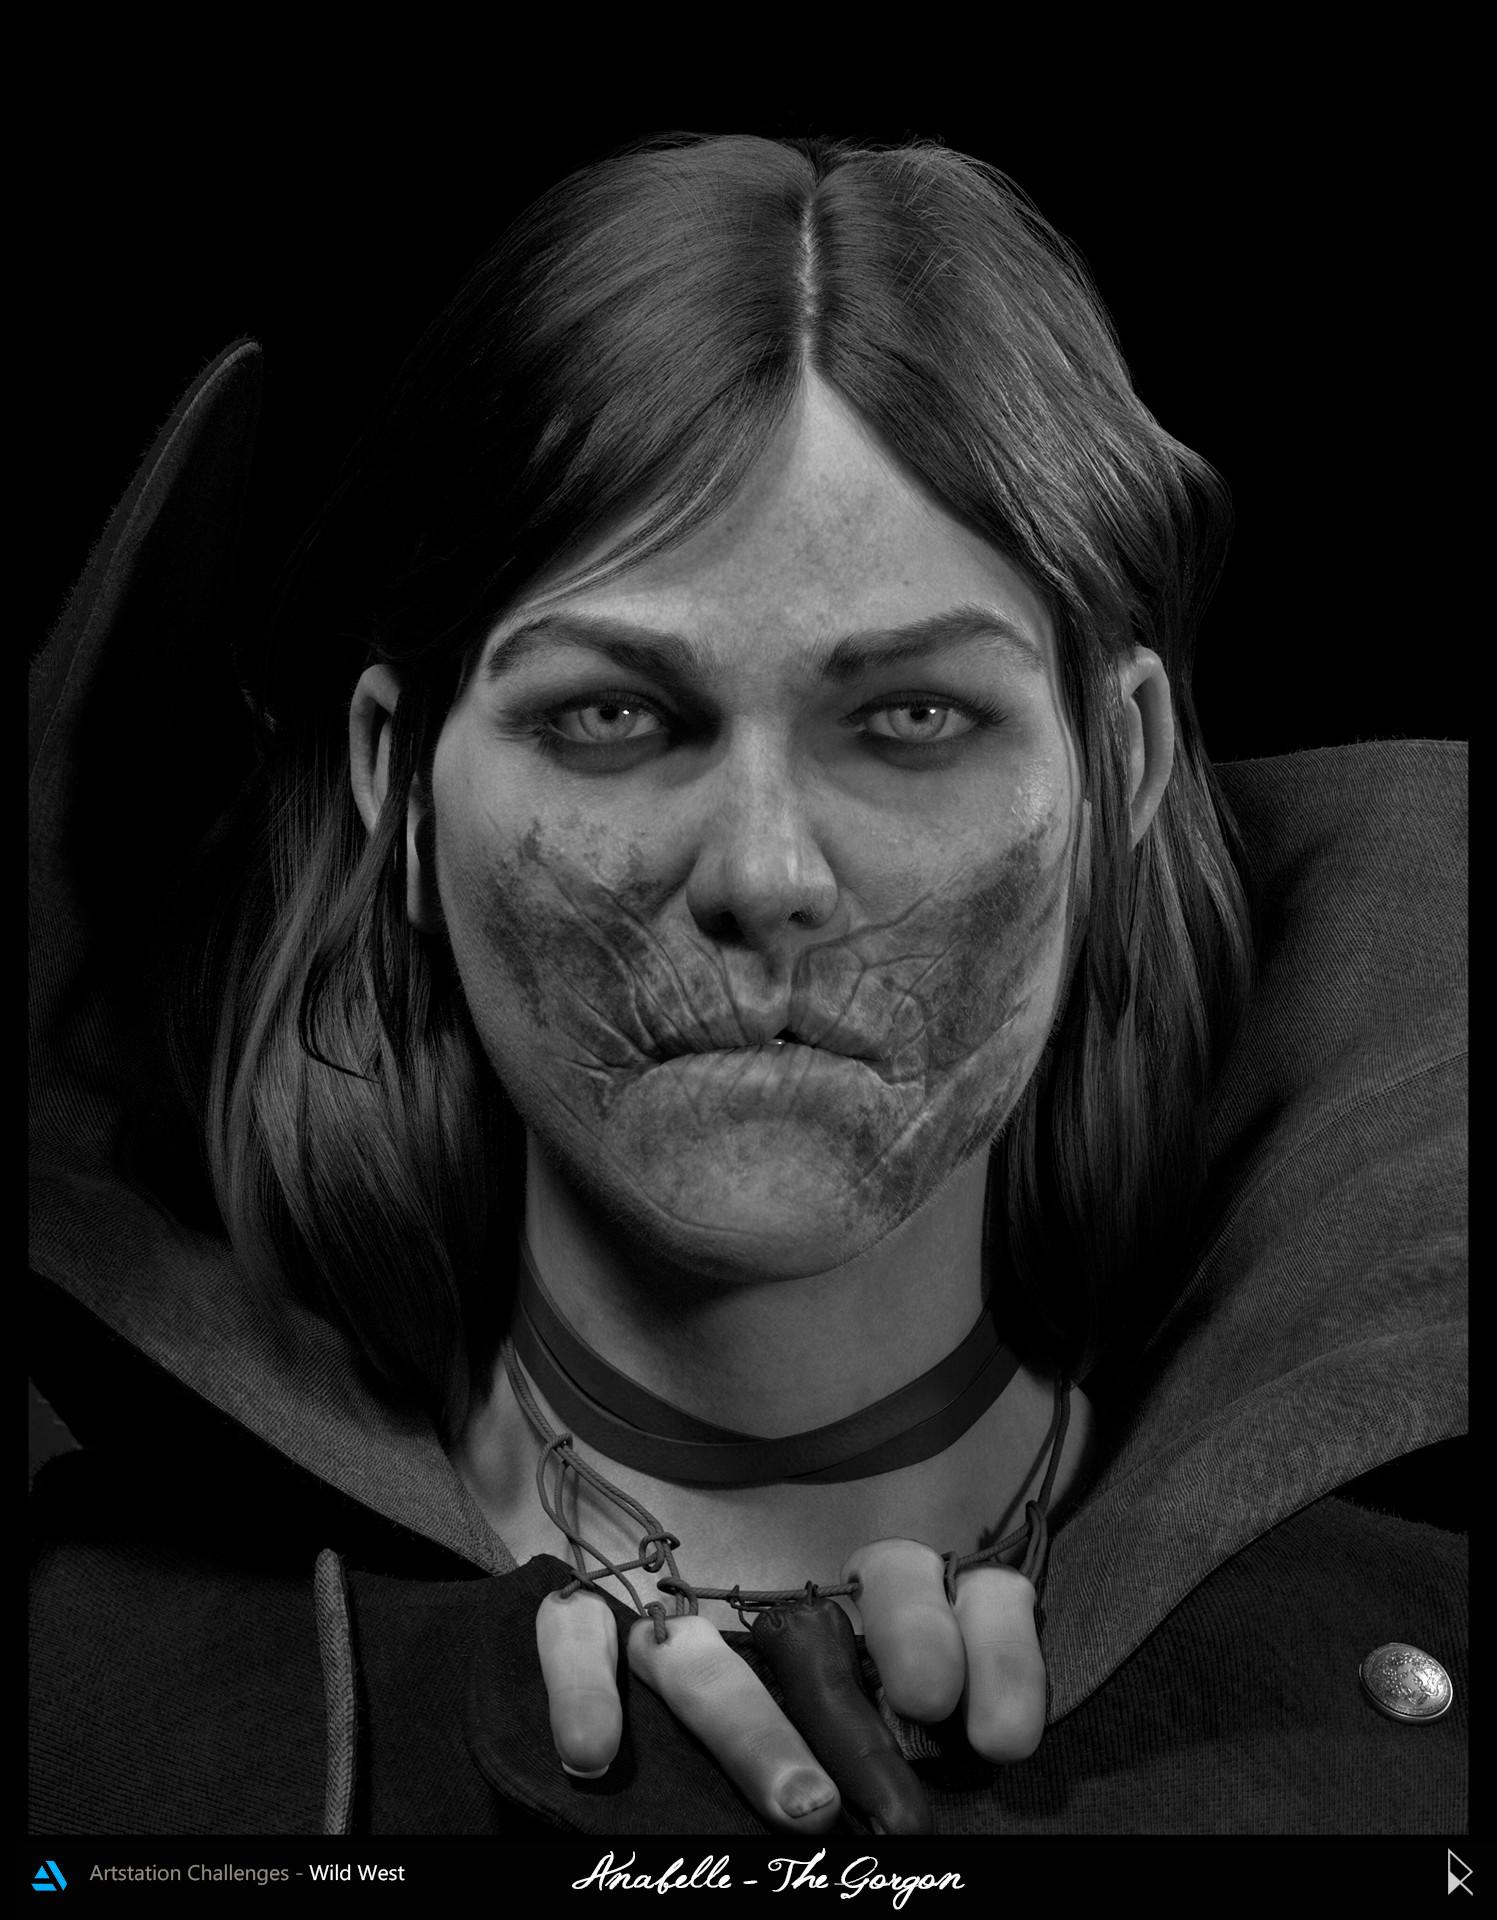 Rodrigo avila face portrait bw